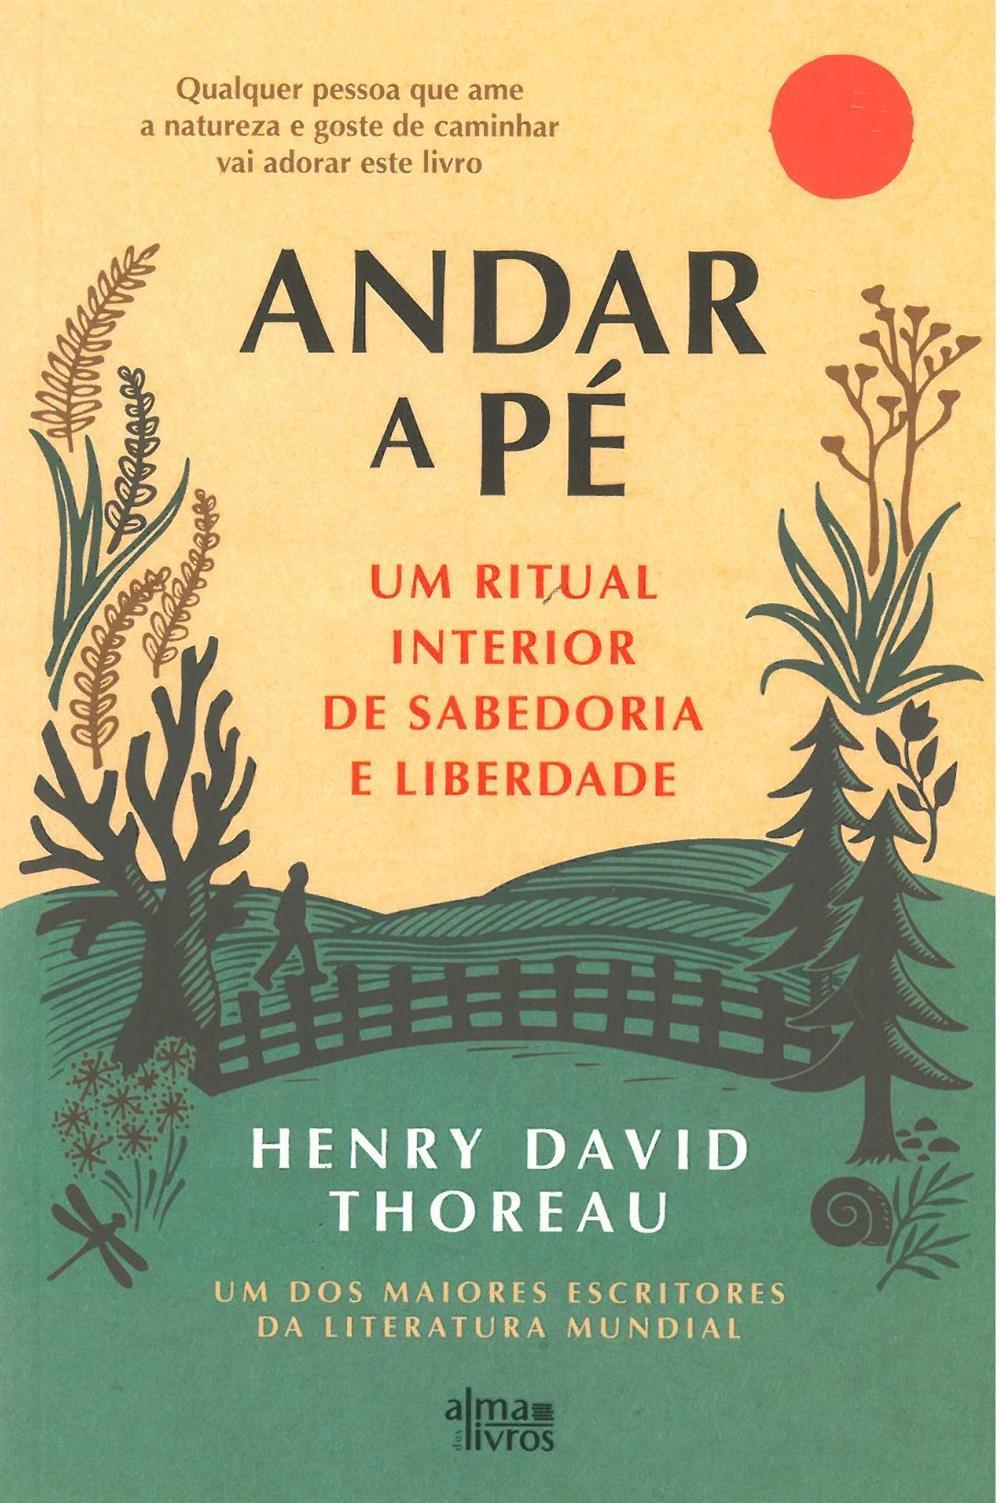 THOREAU, Henry David (2021). Andar a pé.jpg